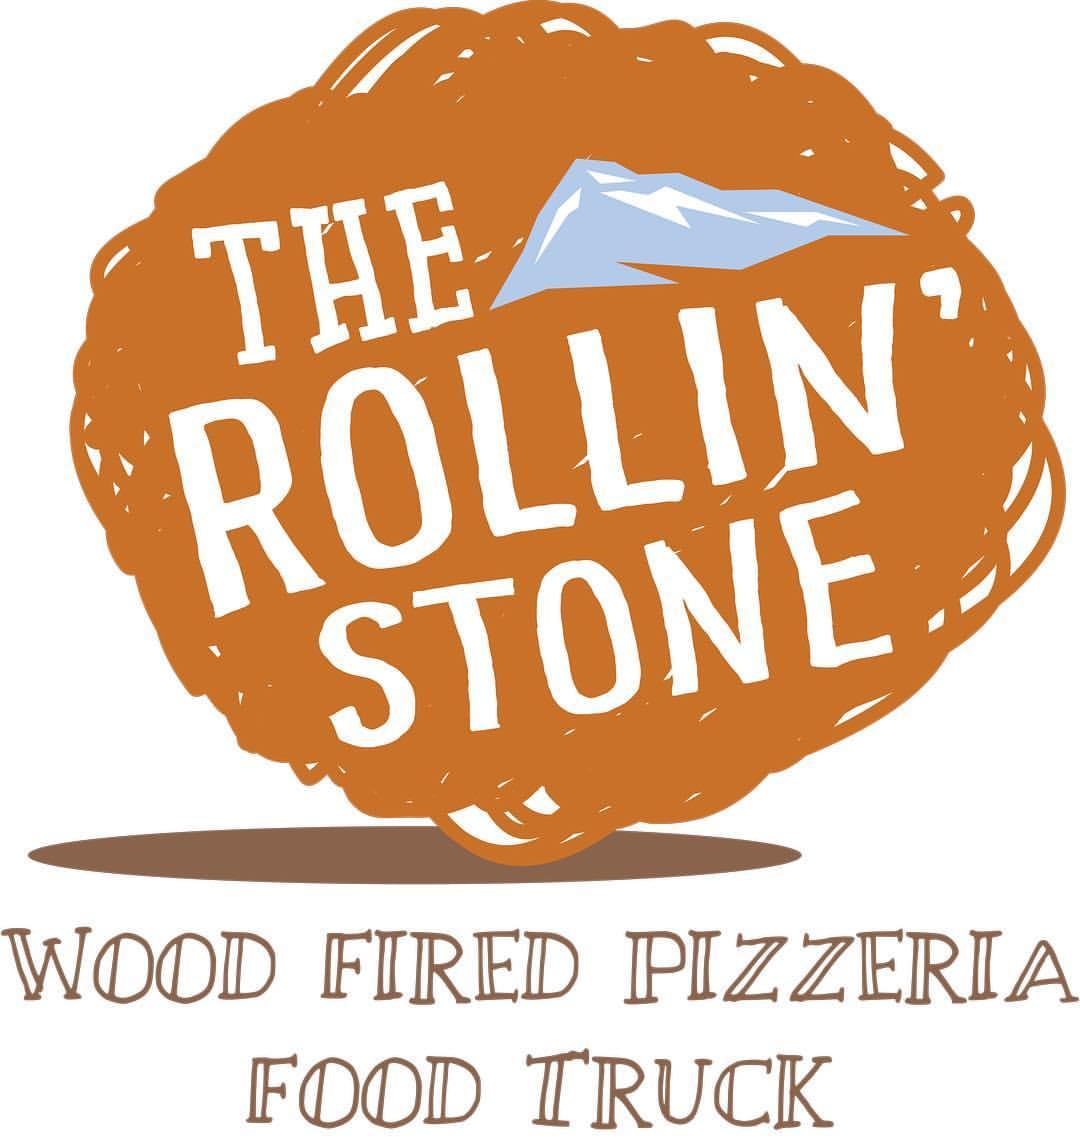 Rollin' Stone Wood Fired Pizzeria logo